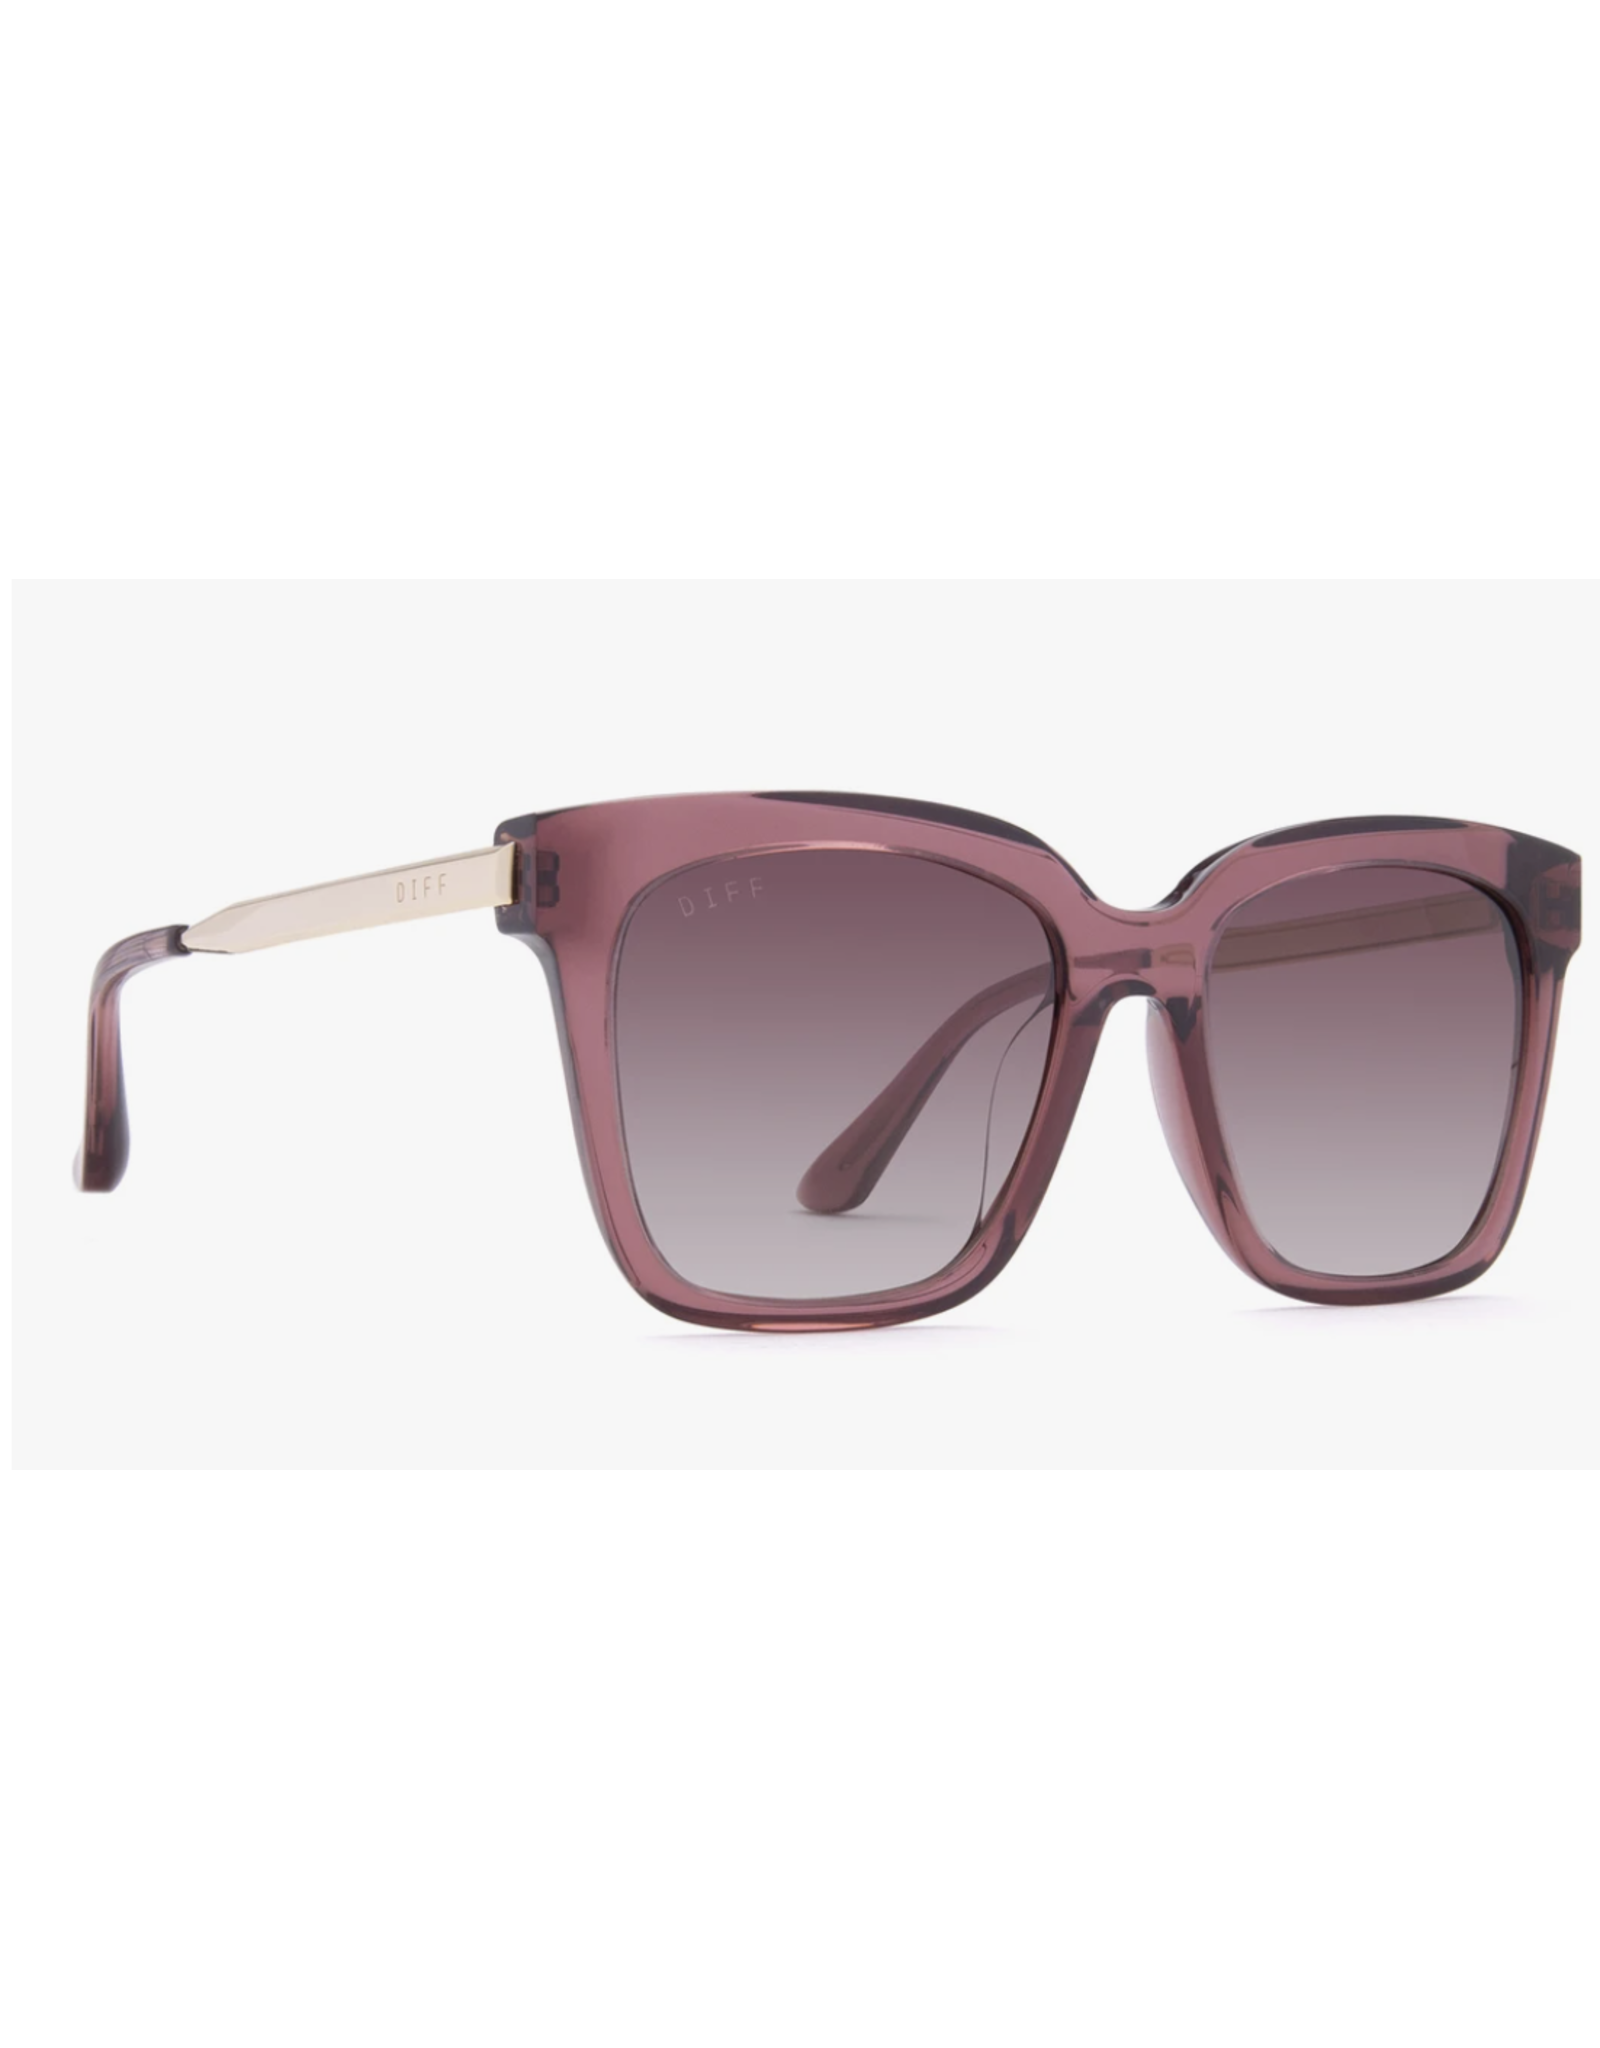 Diff Eyewear Bella -polarized